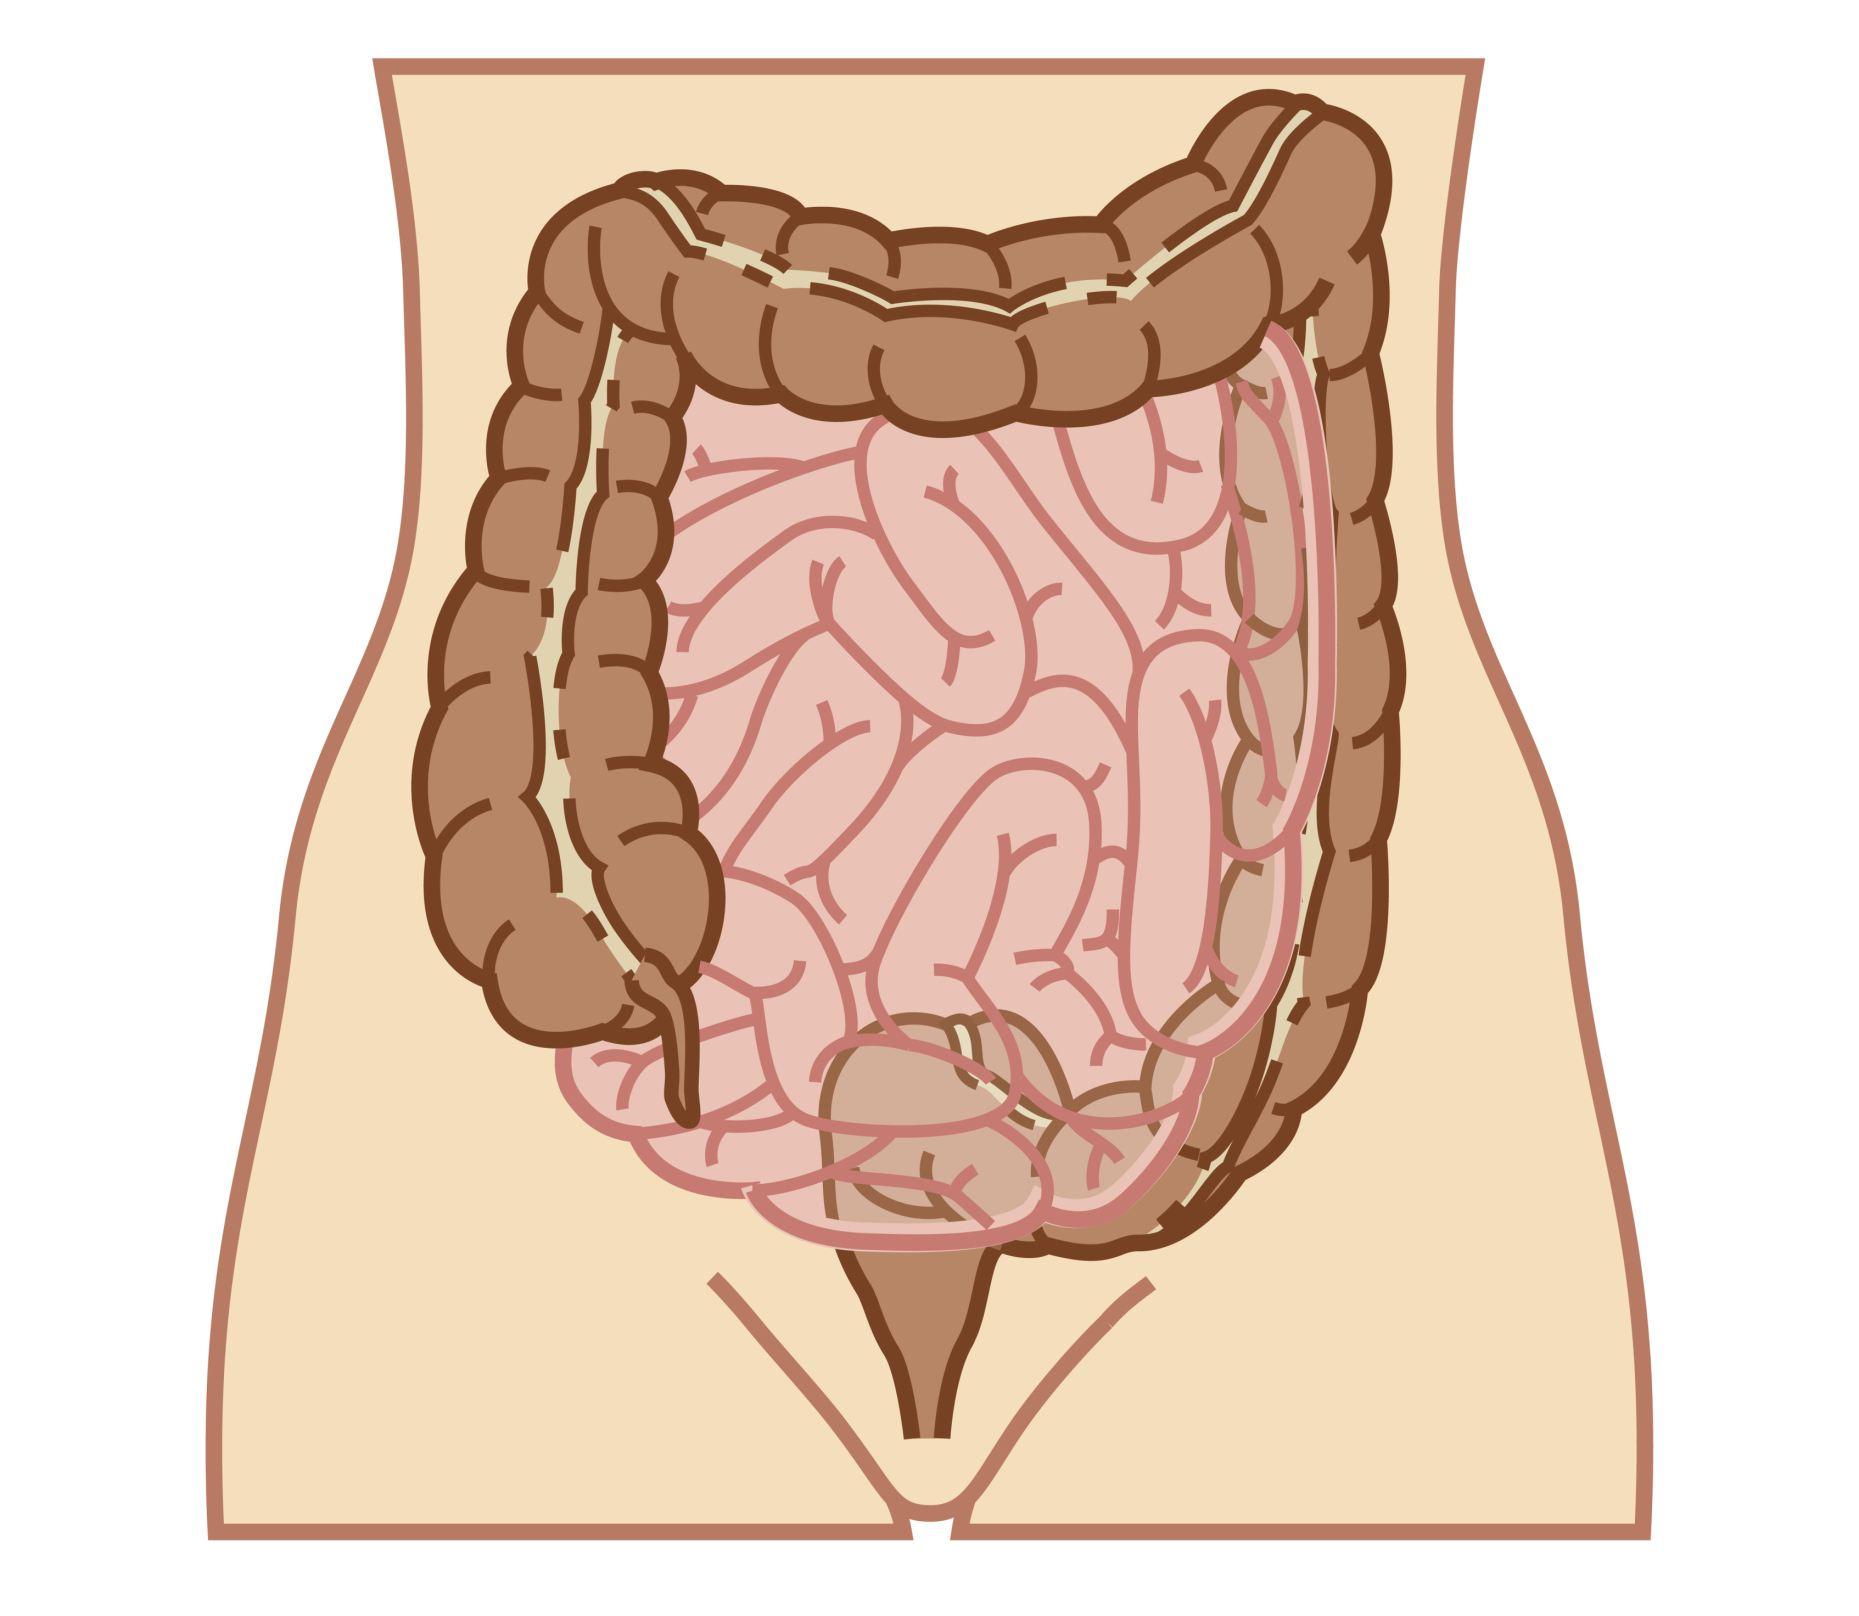 hight resolution of bowel perforation